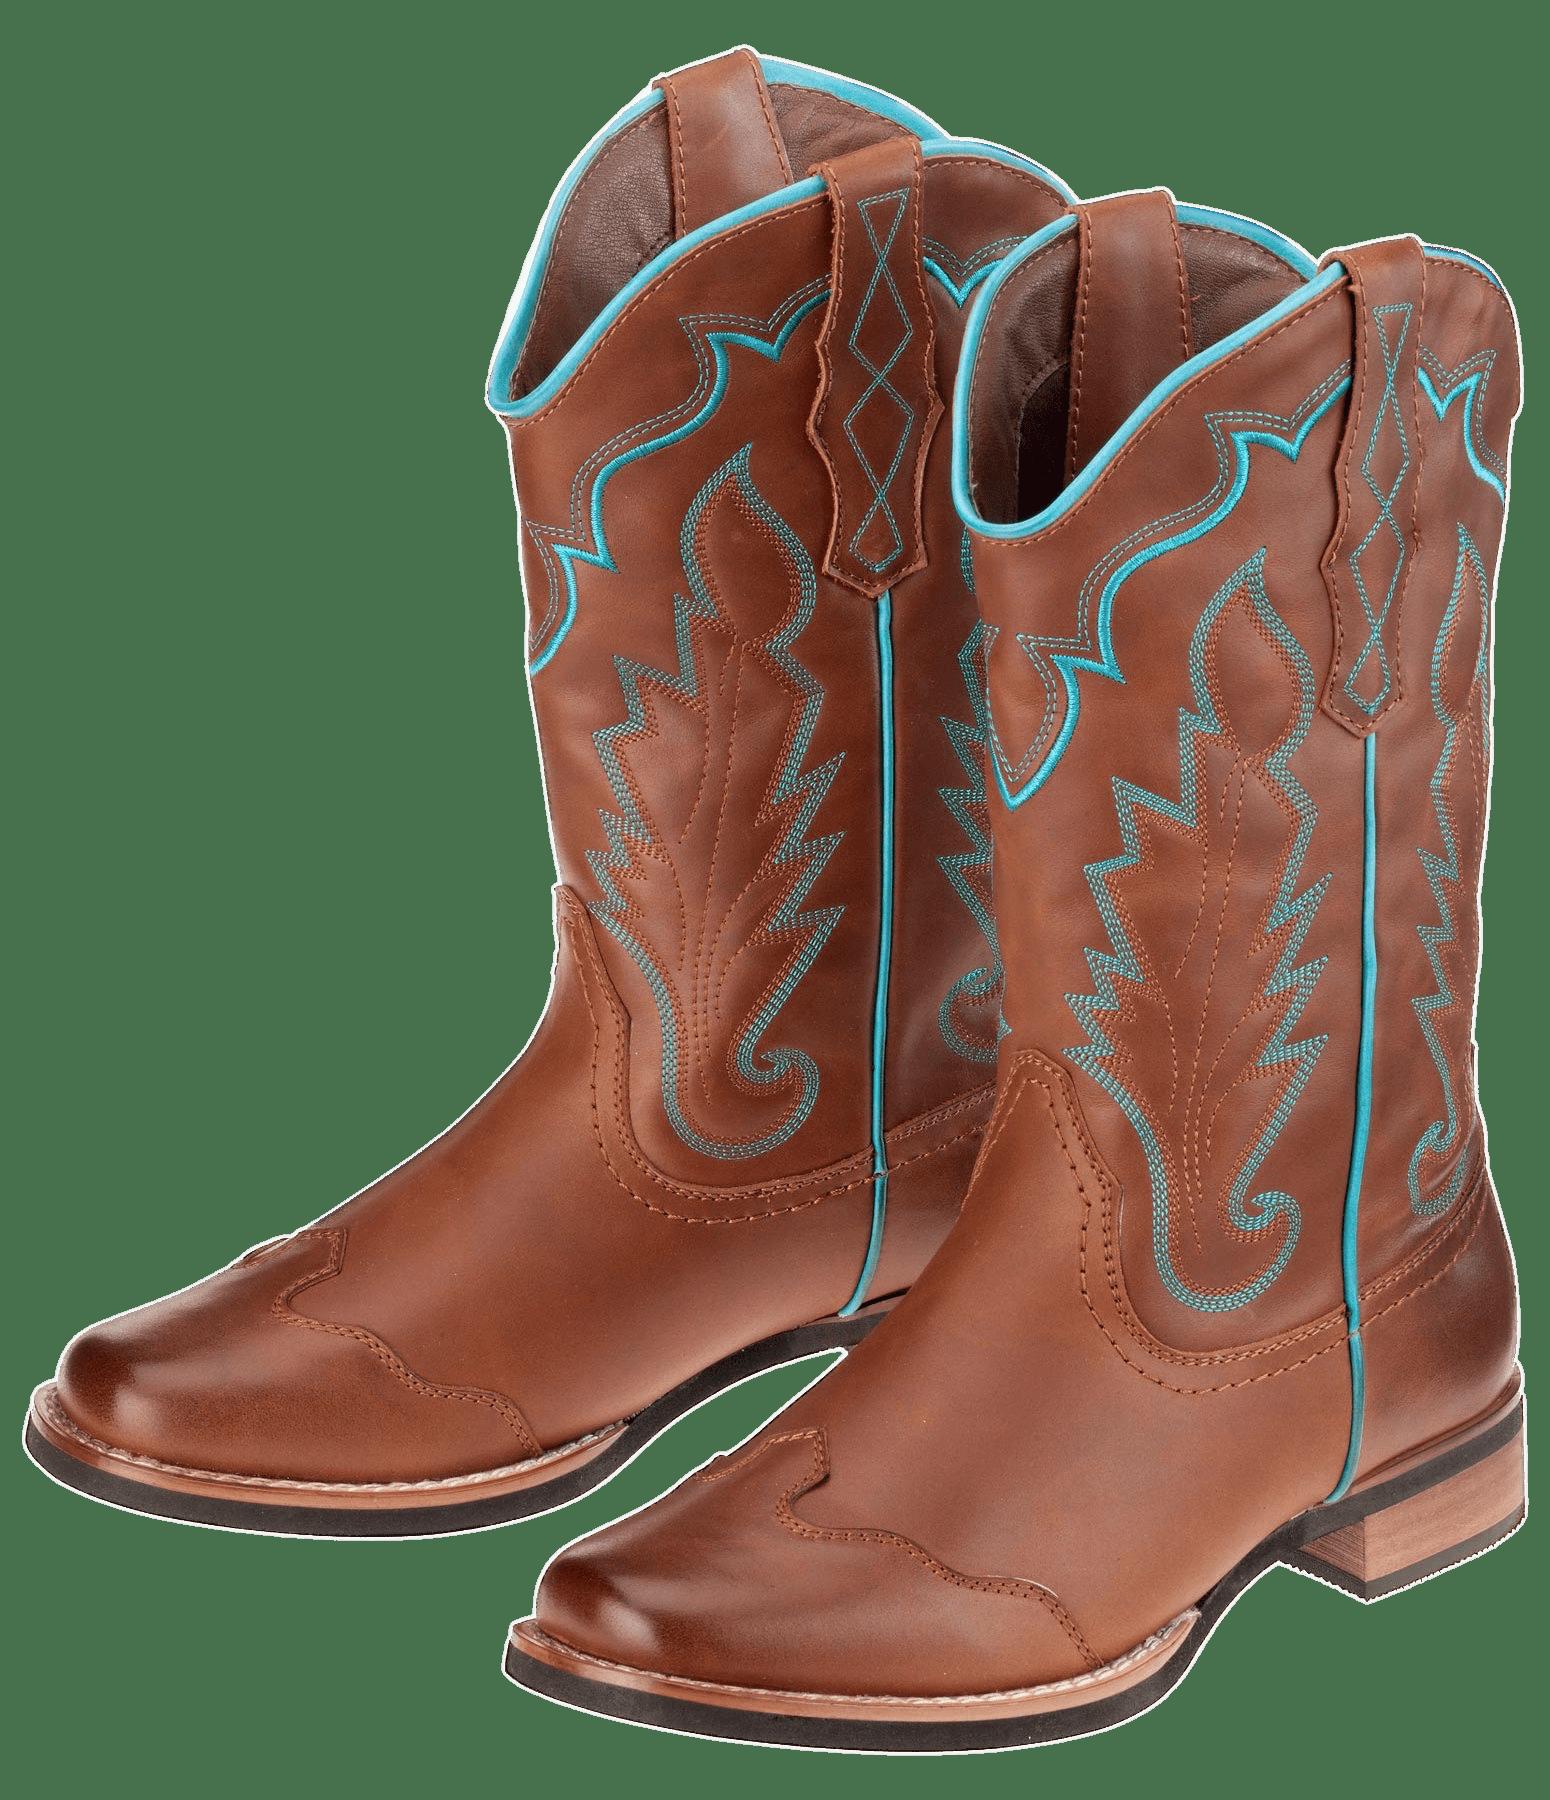 Western Riding Cowboy Boots transparent PNG.